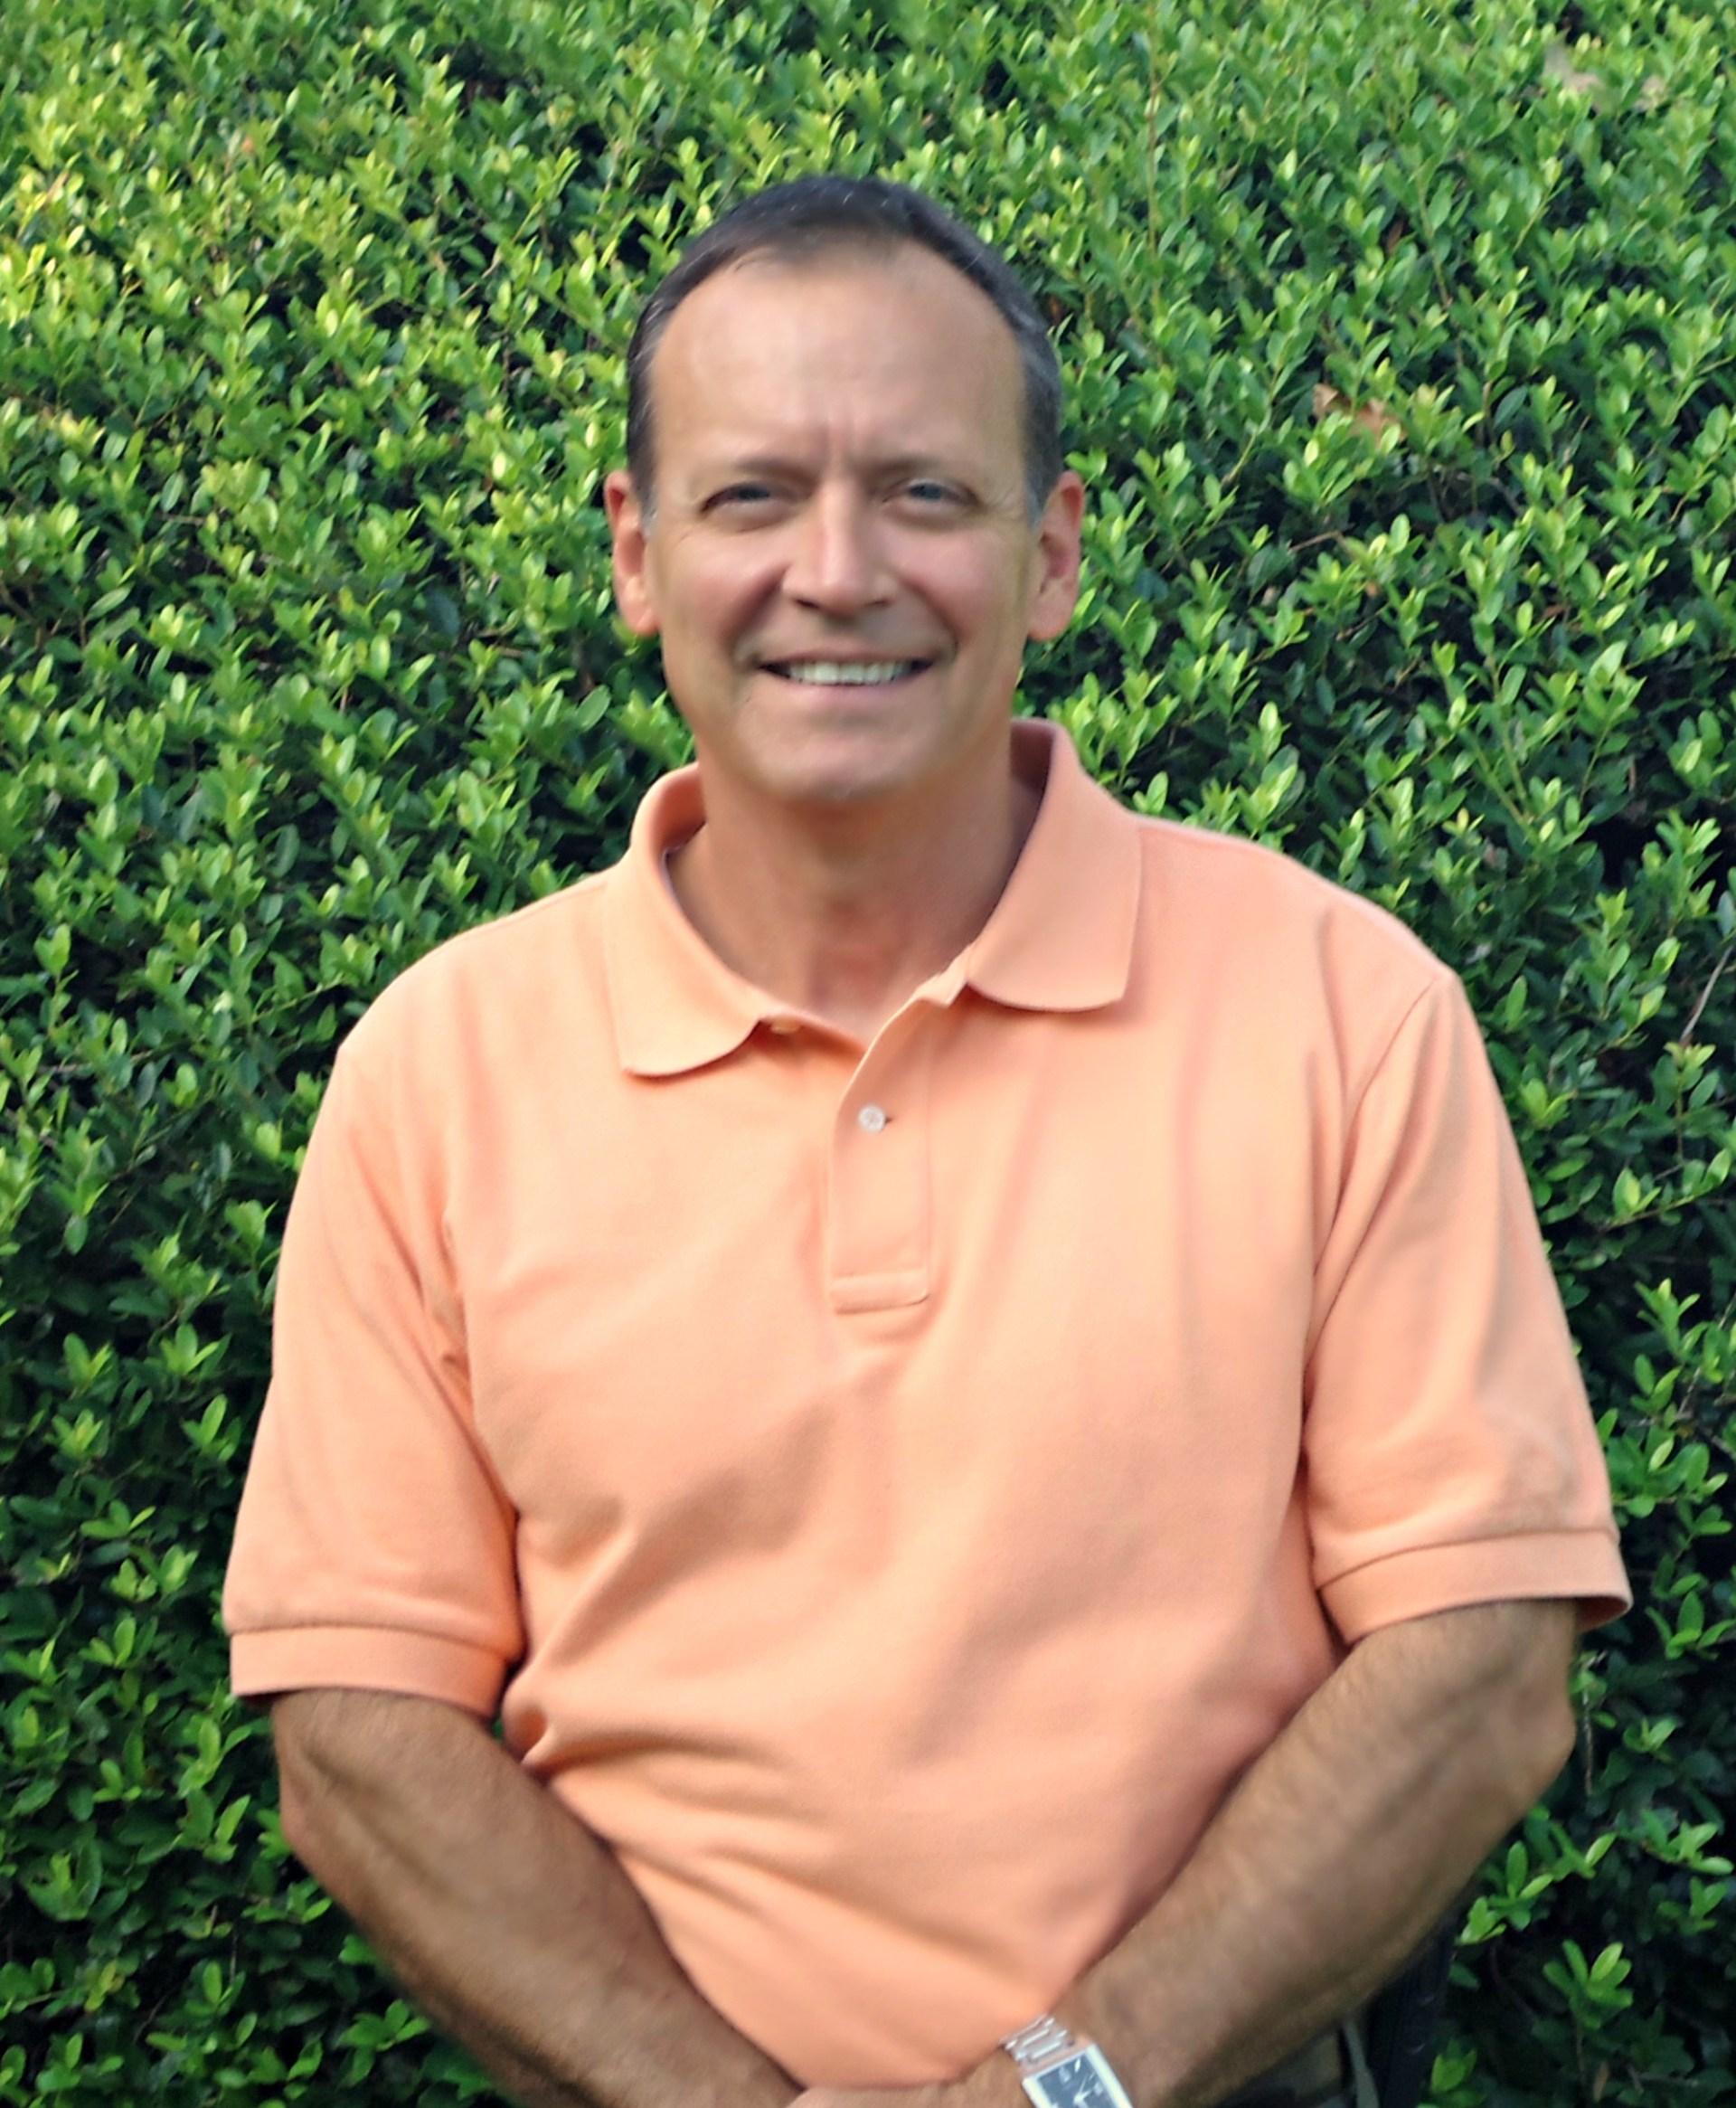 Academy Principal Jeff Smith